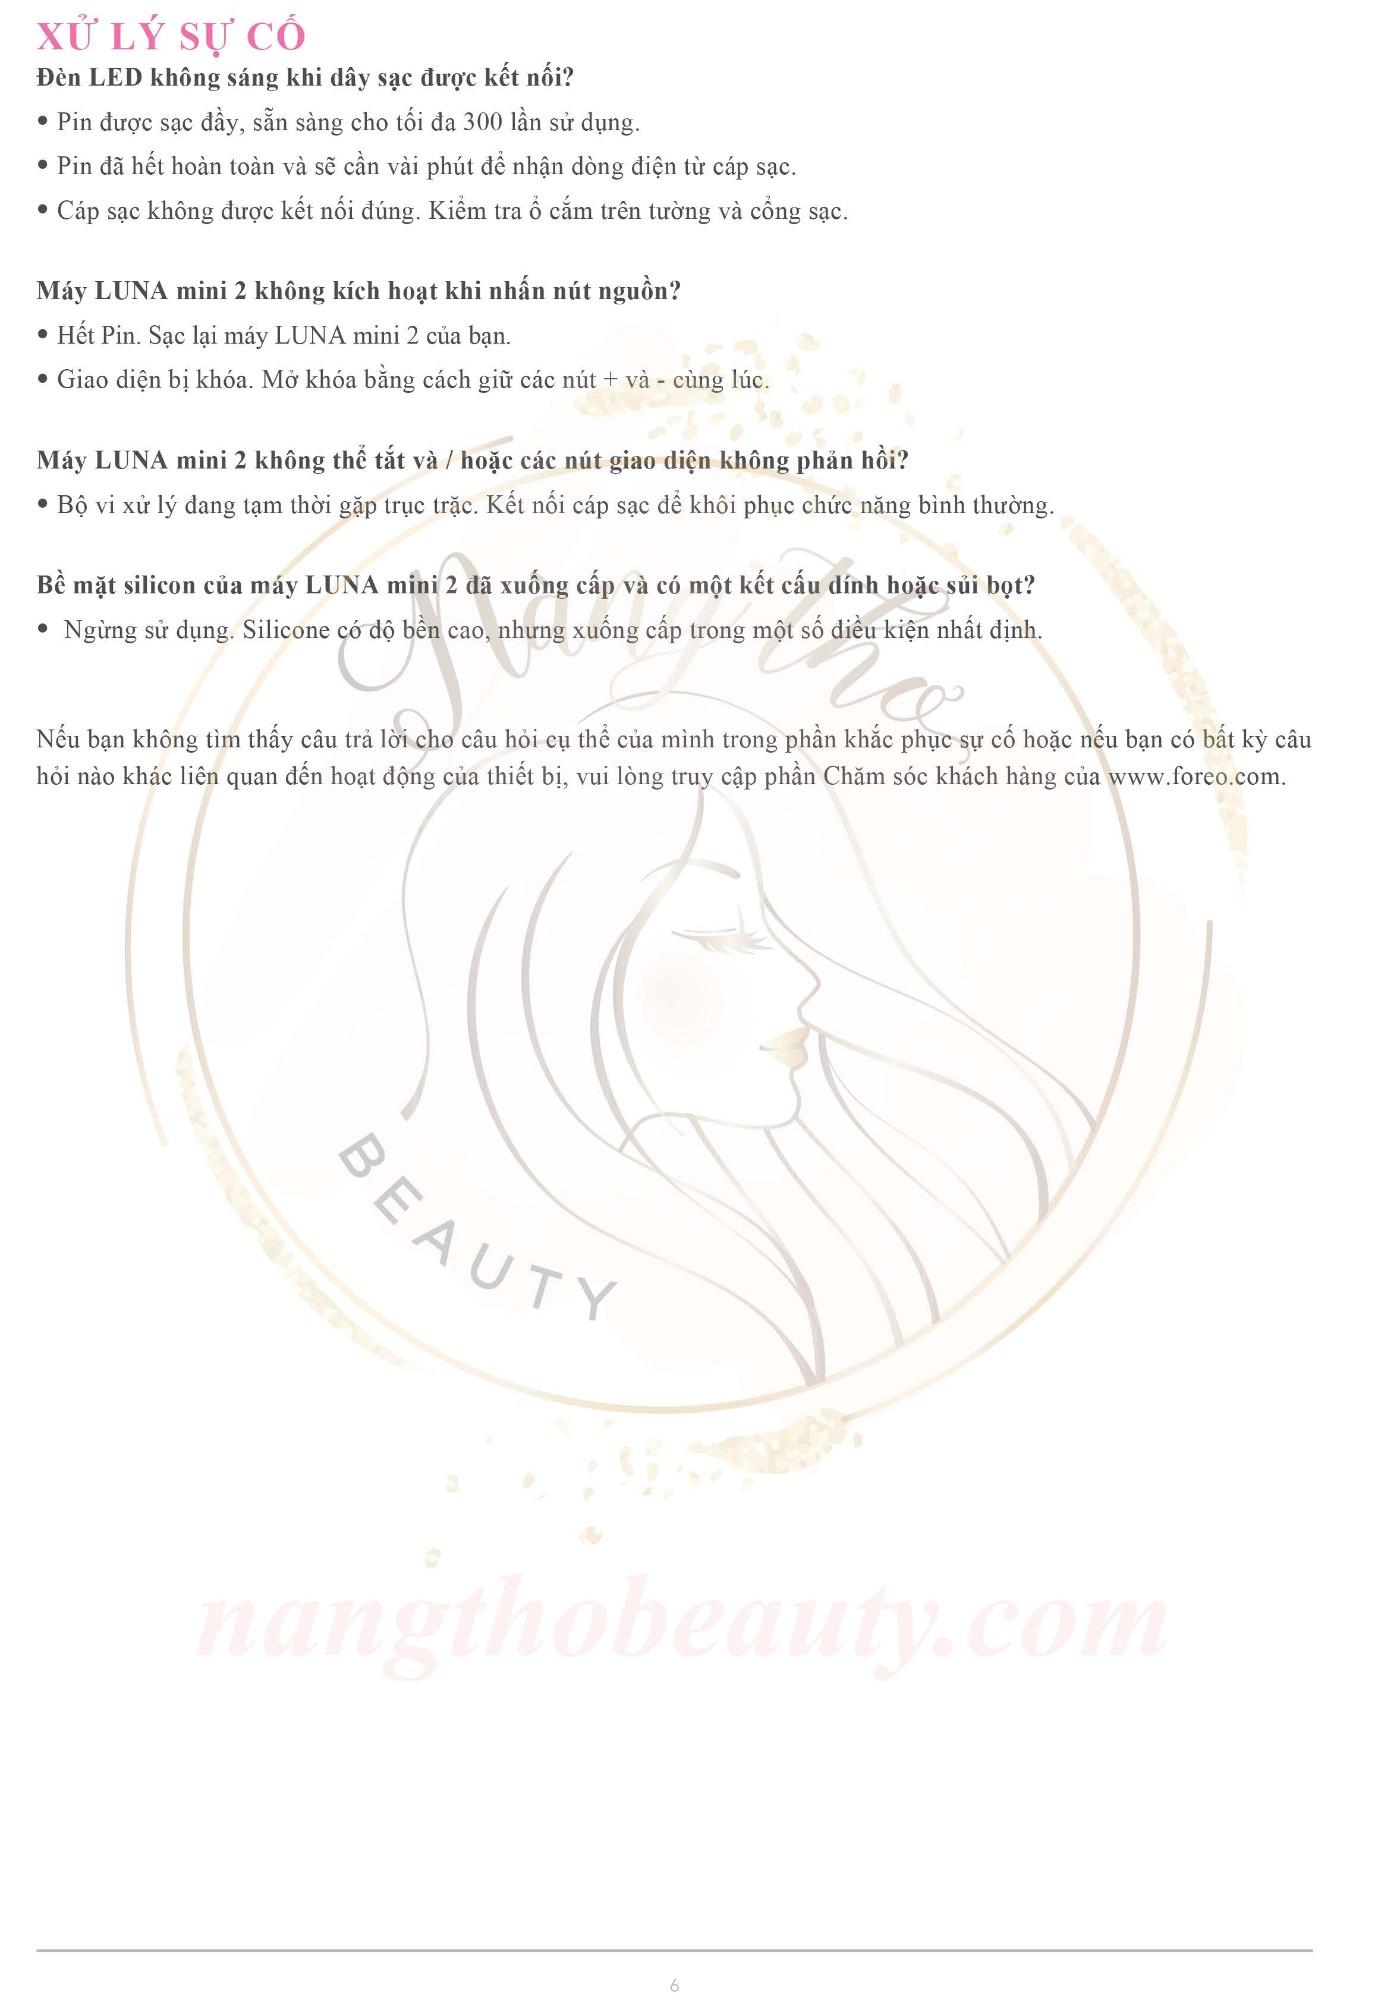 Huong_dan_su_dung_Luna_mini_2_Page_6